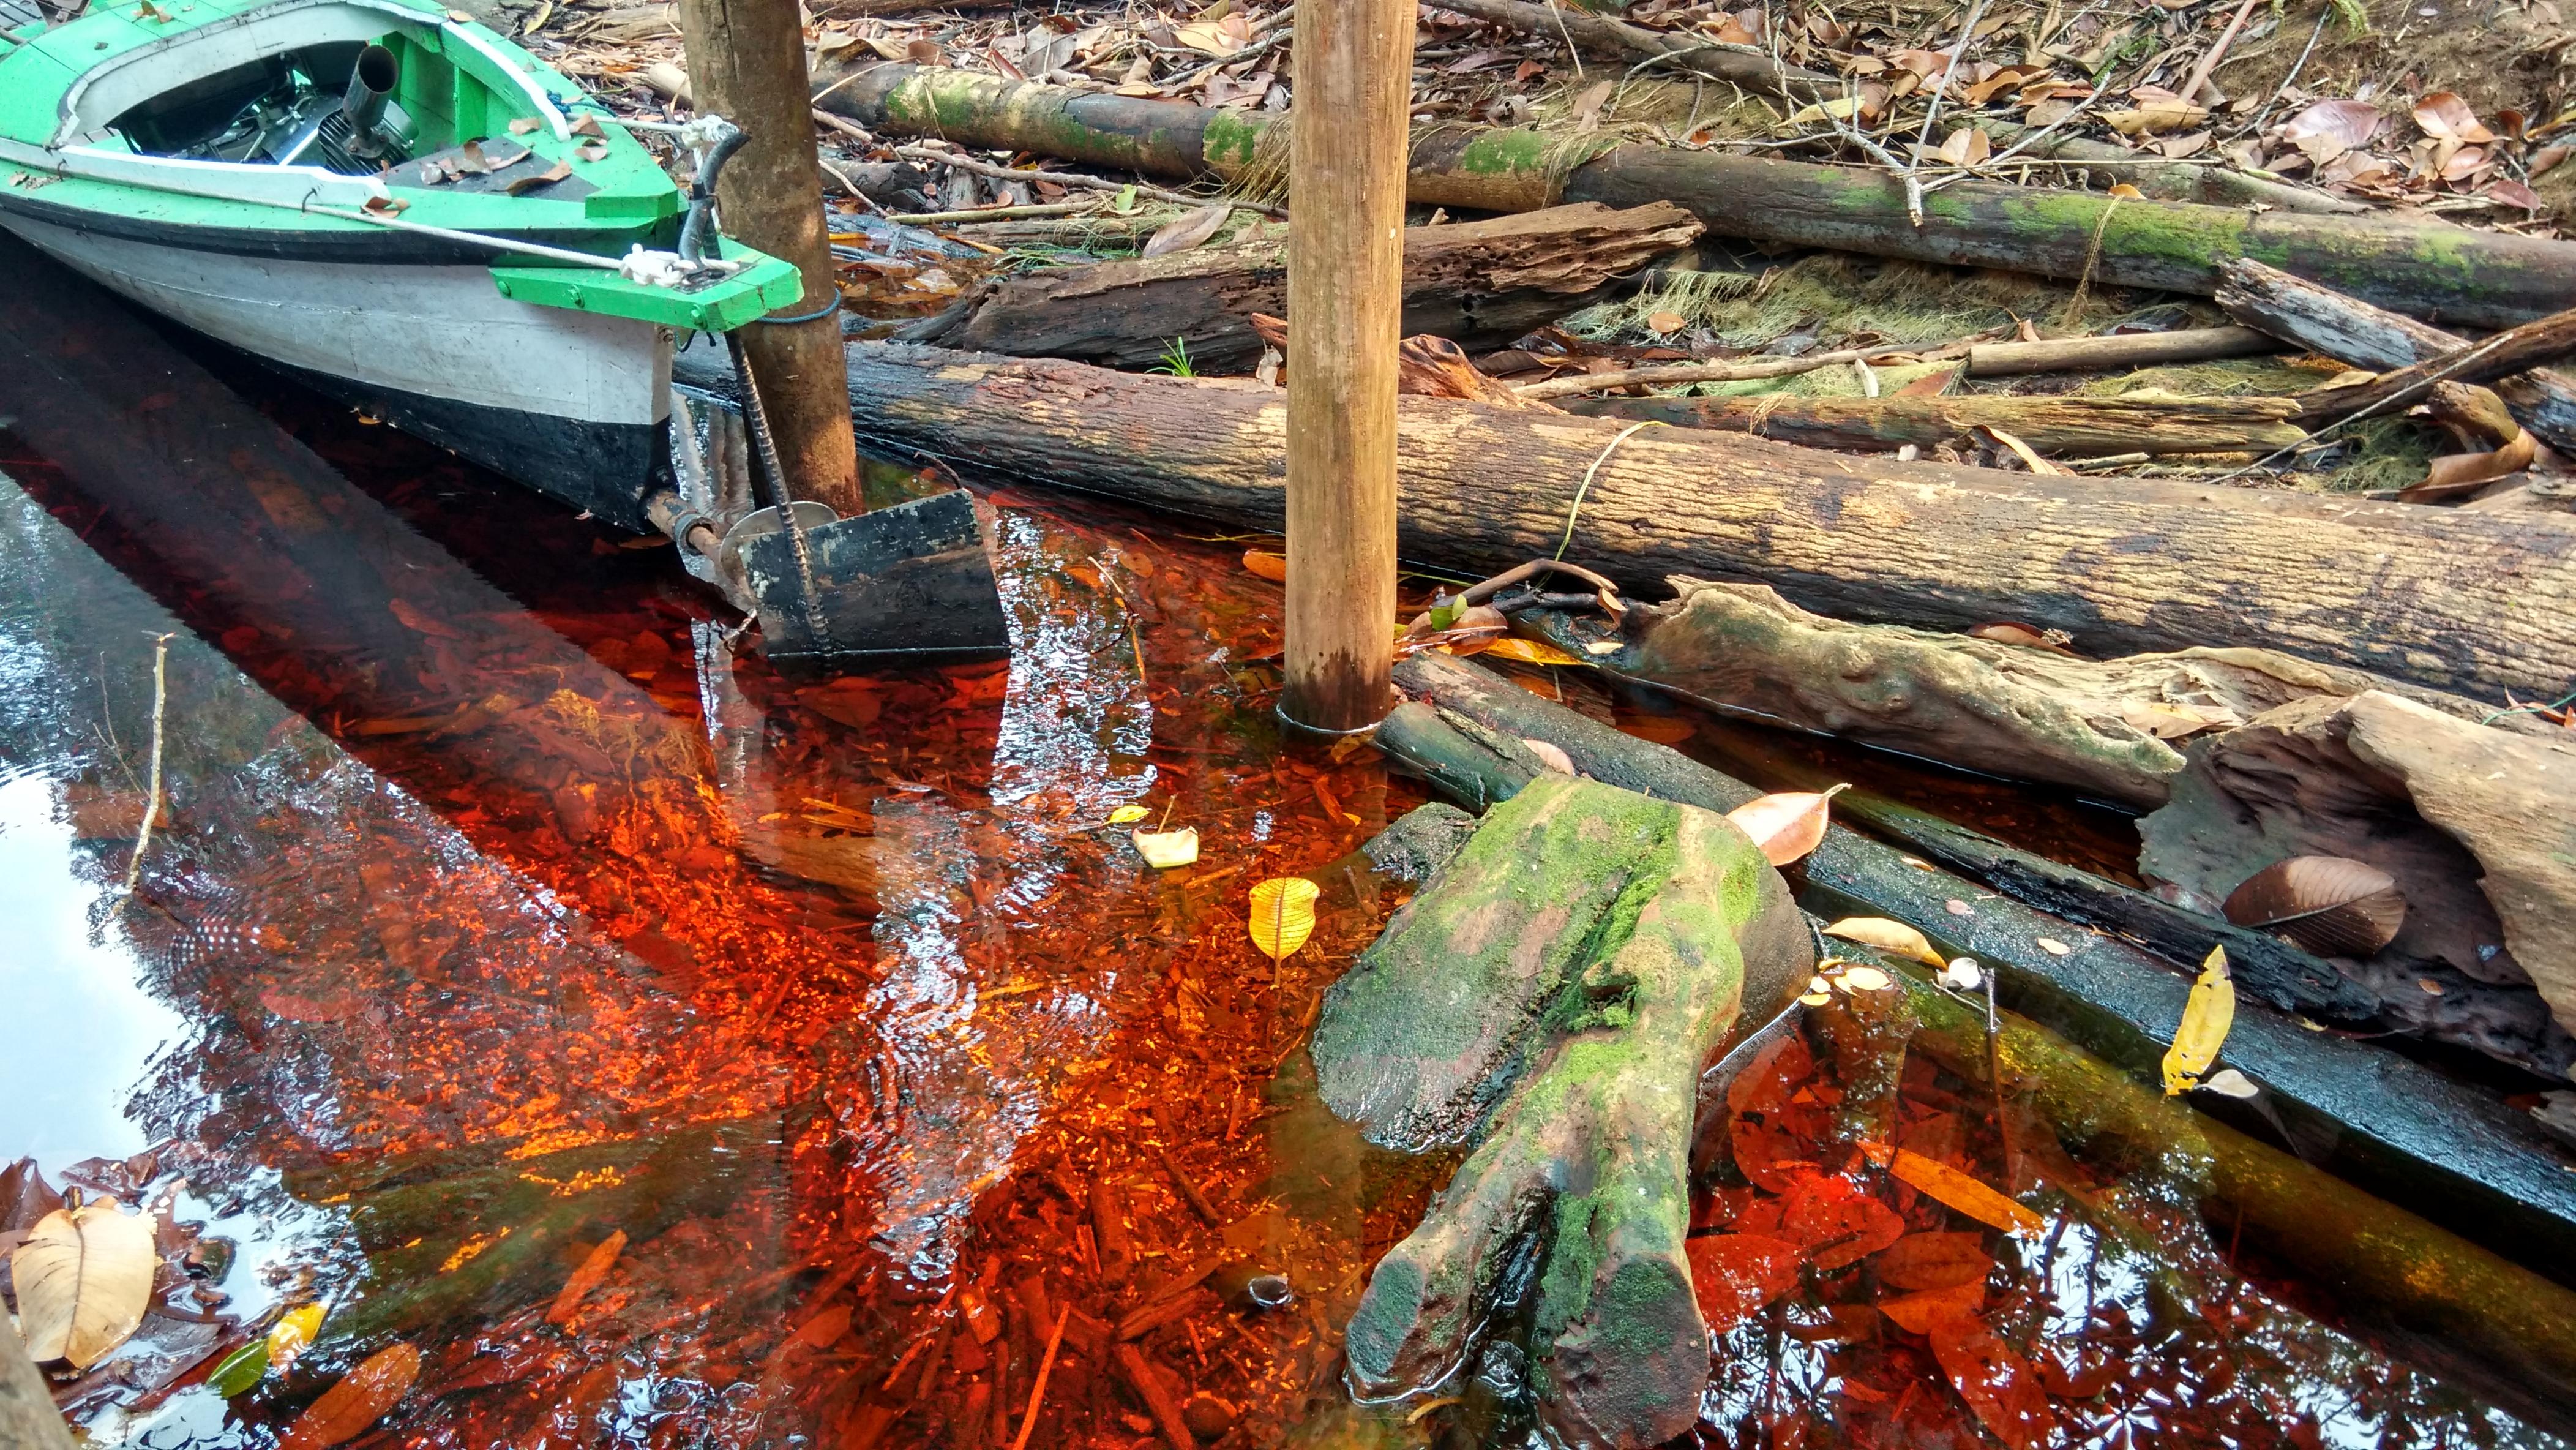 Trekking Taman Nasional Sebangau Demi Melihat Orangutan Senja Air Kawasan